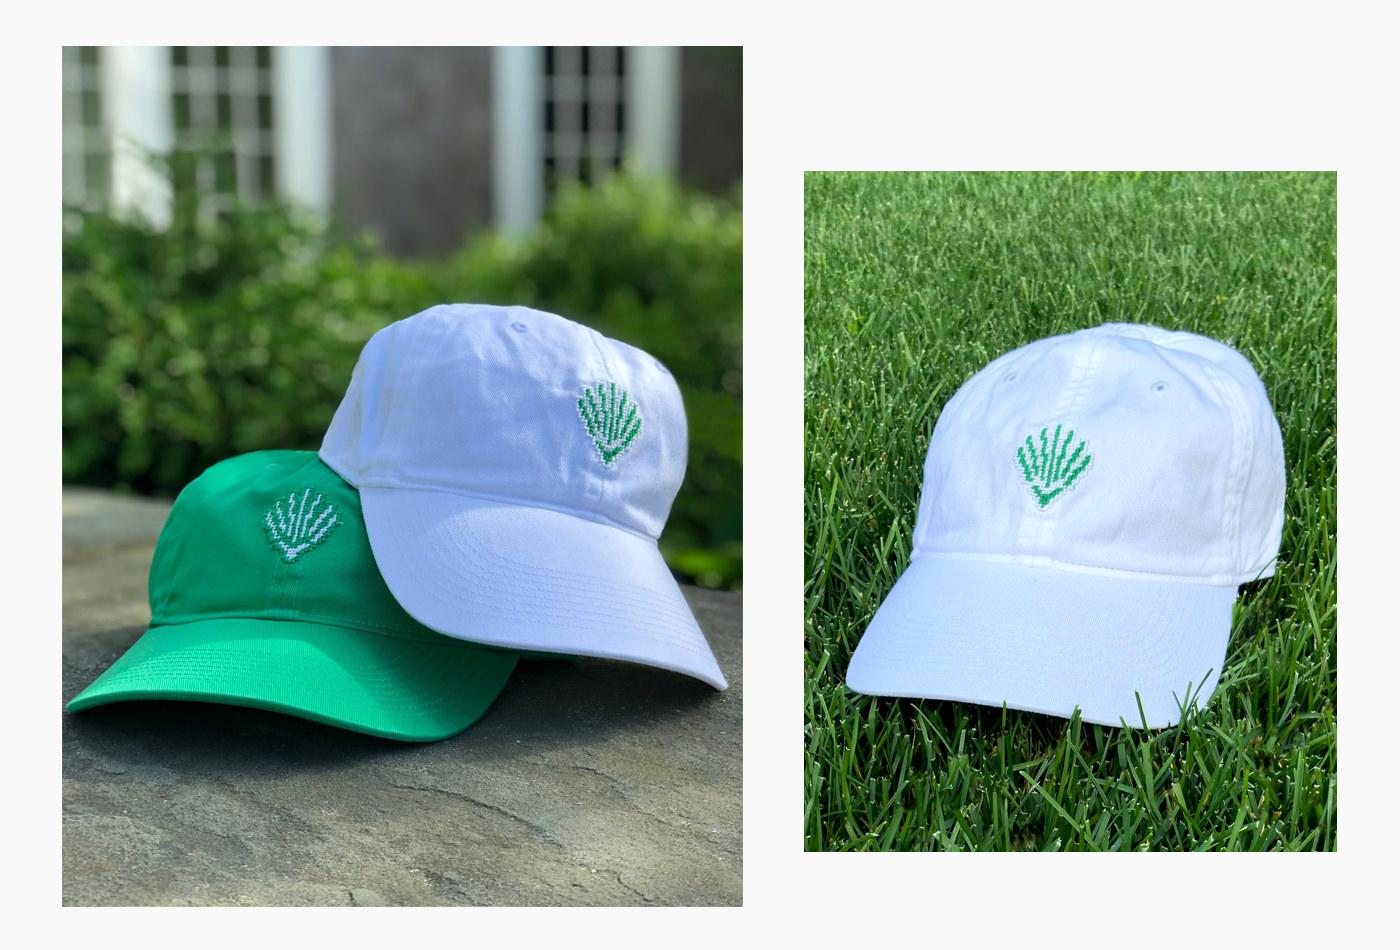 hedge-dress-polo-vacaliebres-hedgehog-logo-hat-cap-smarthers-&-branson